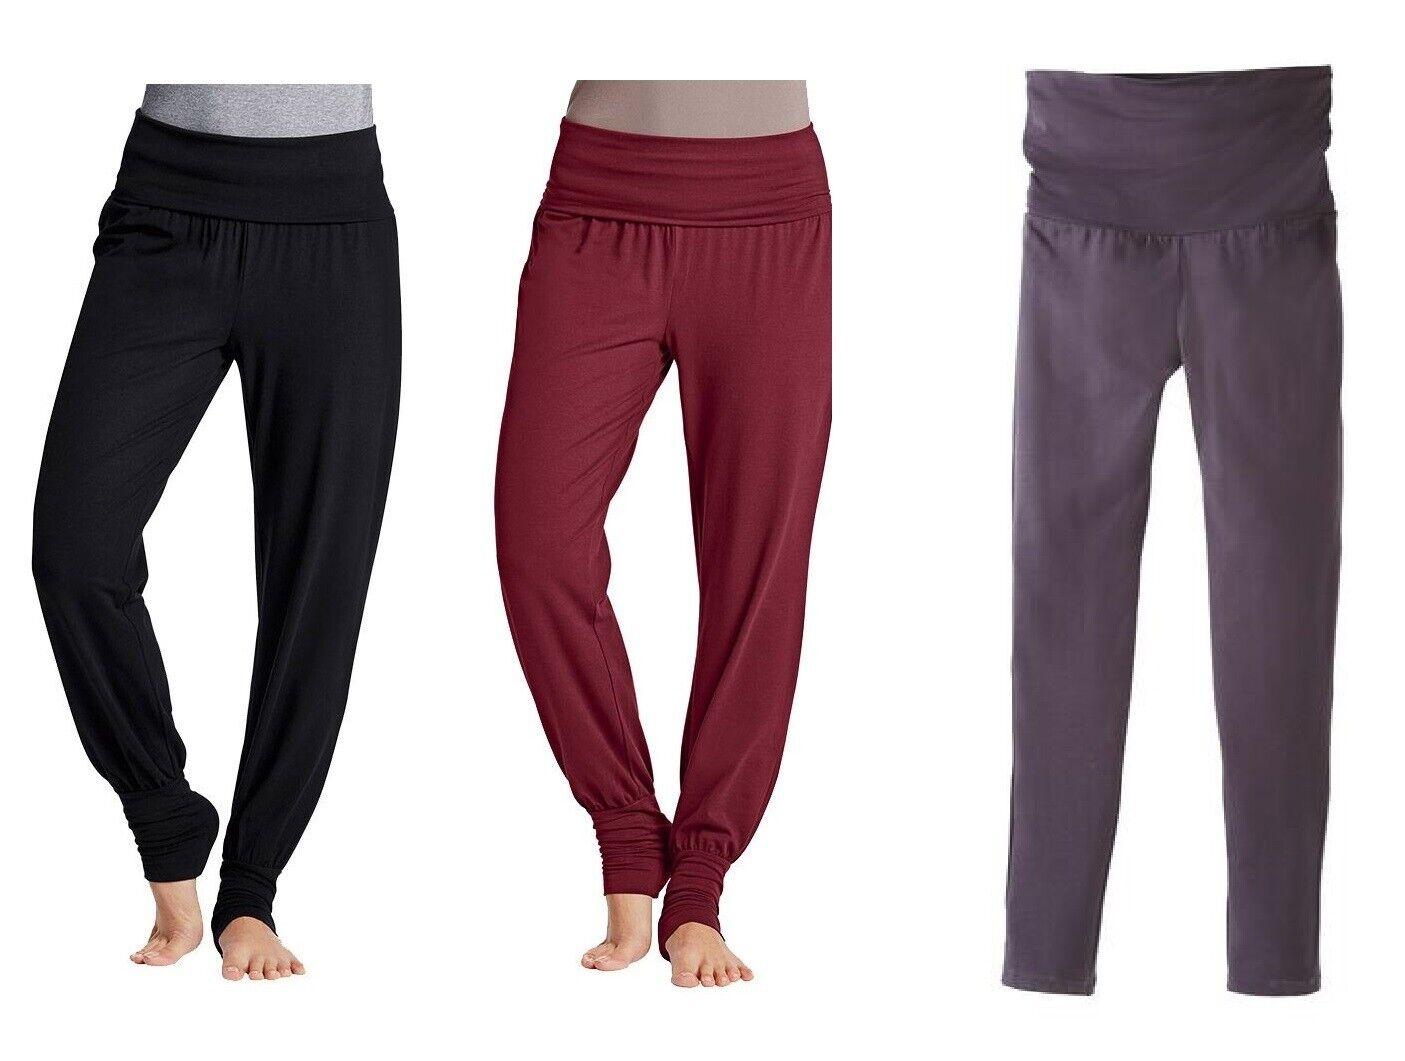 Damen Laufhose Sporthose Fitnesshose Freizeithose Funktionshose Jazz yoga Modal